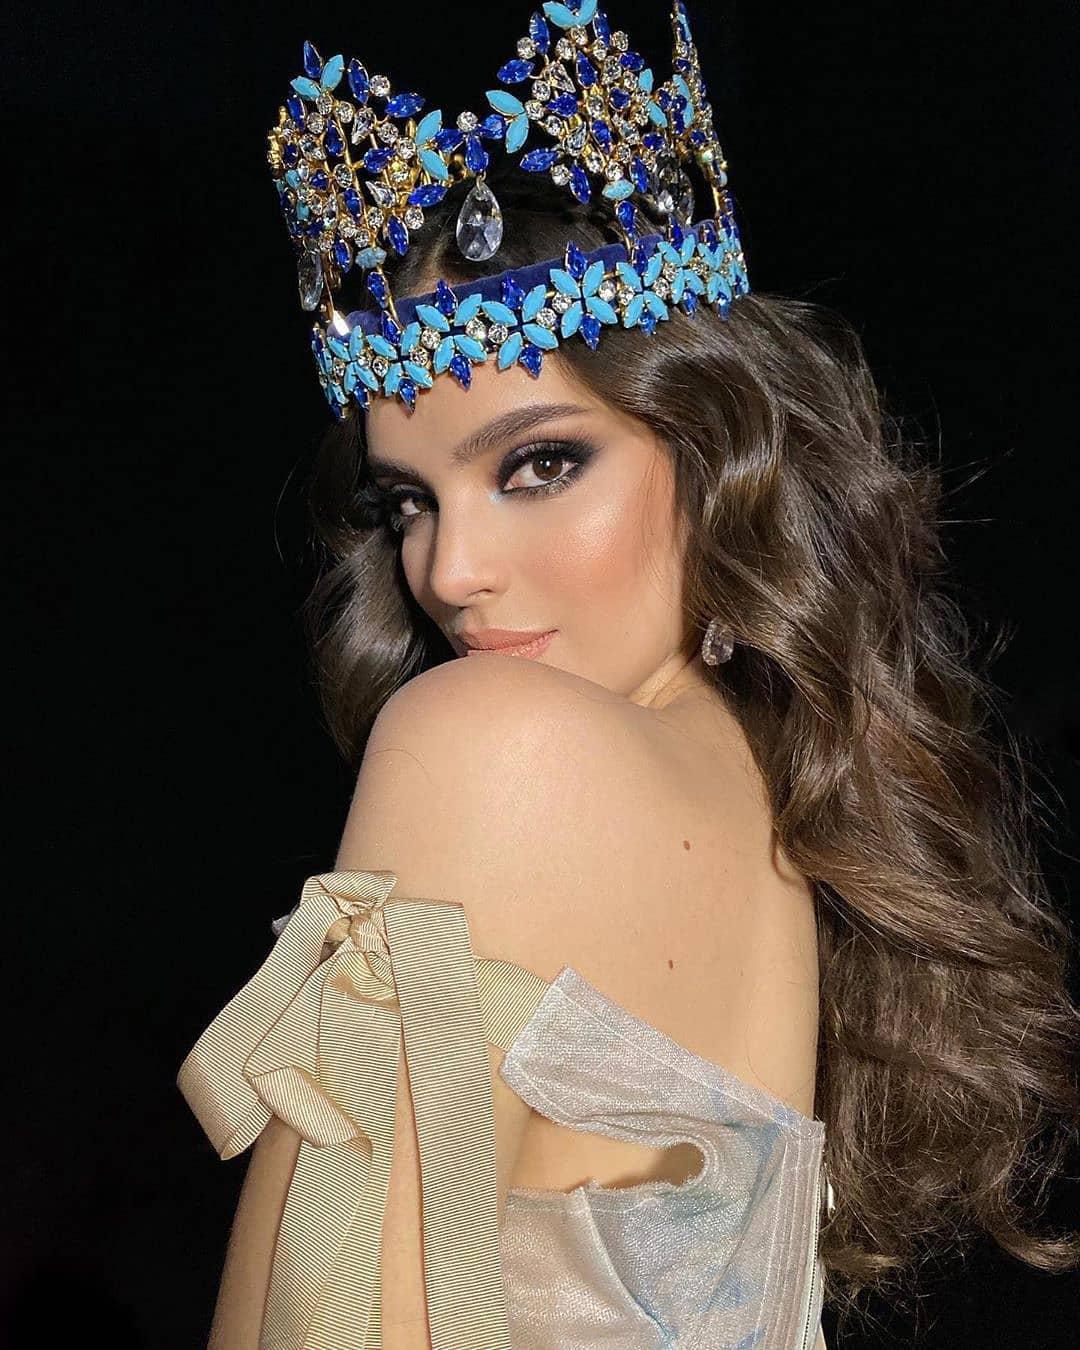 vanessa ponce de leon, miss world 2018. II - Página 14 79900811